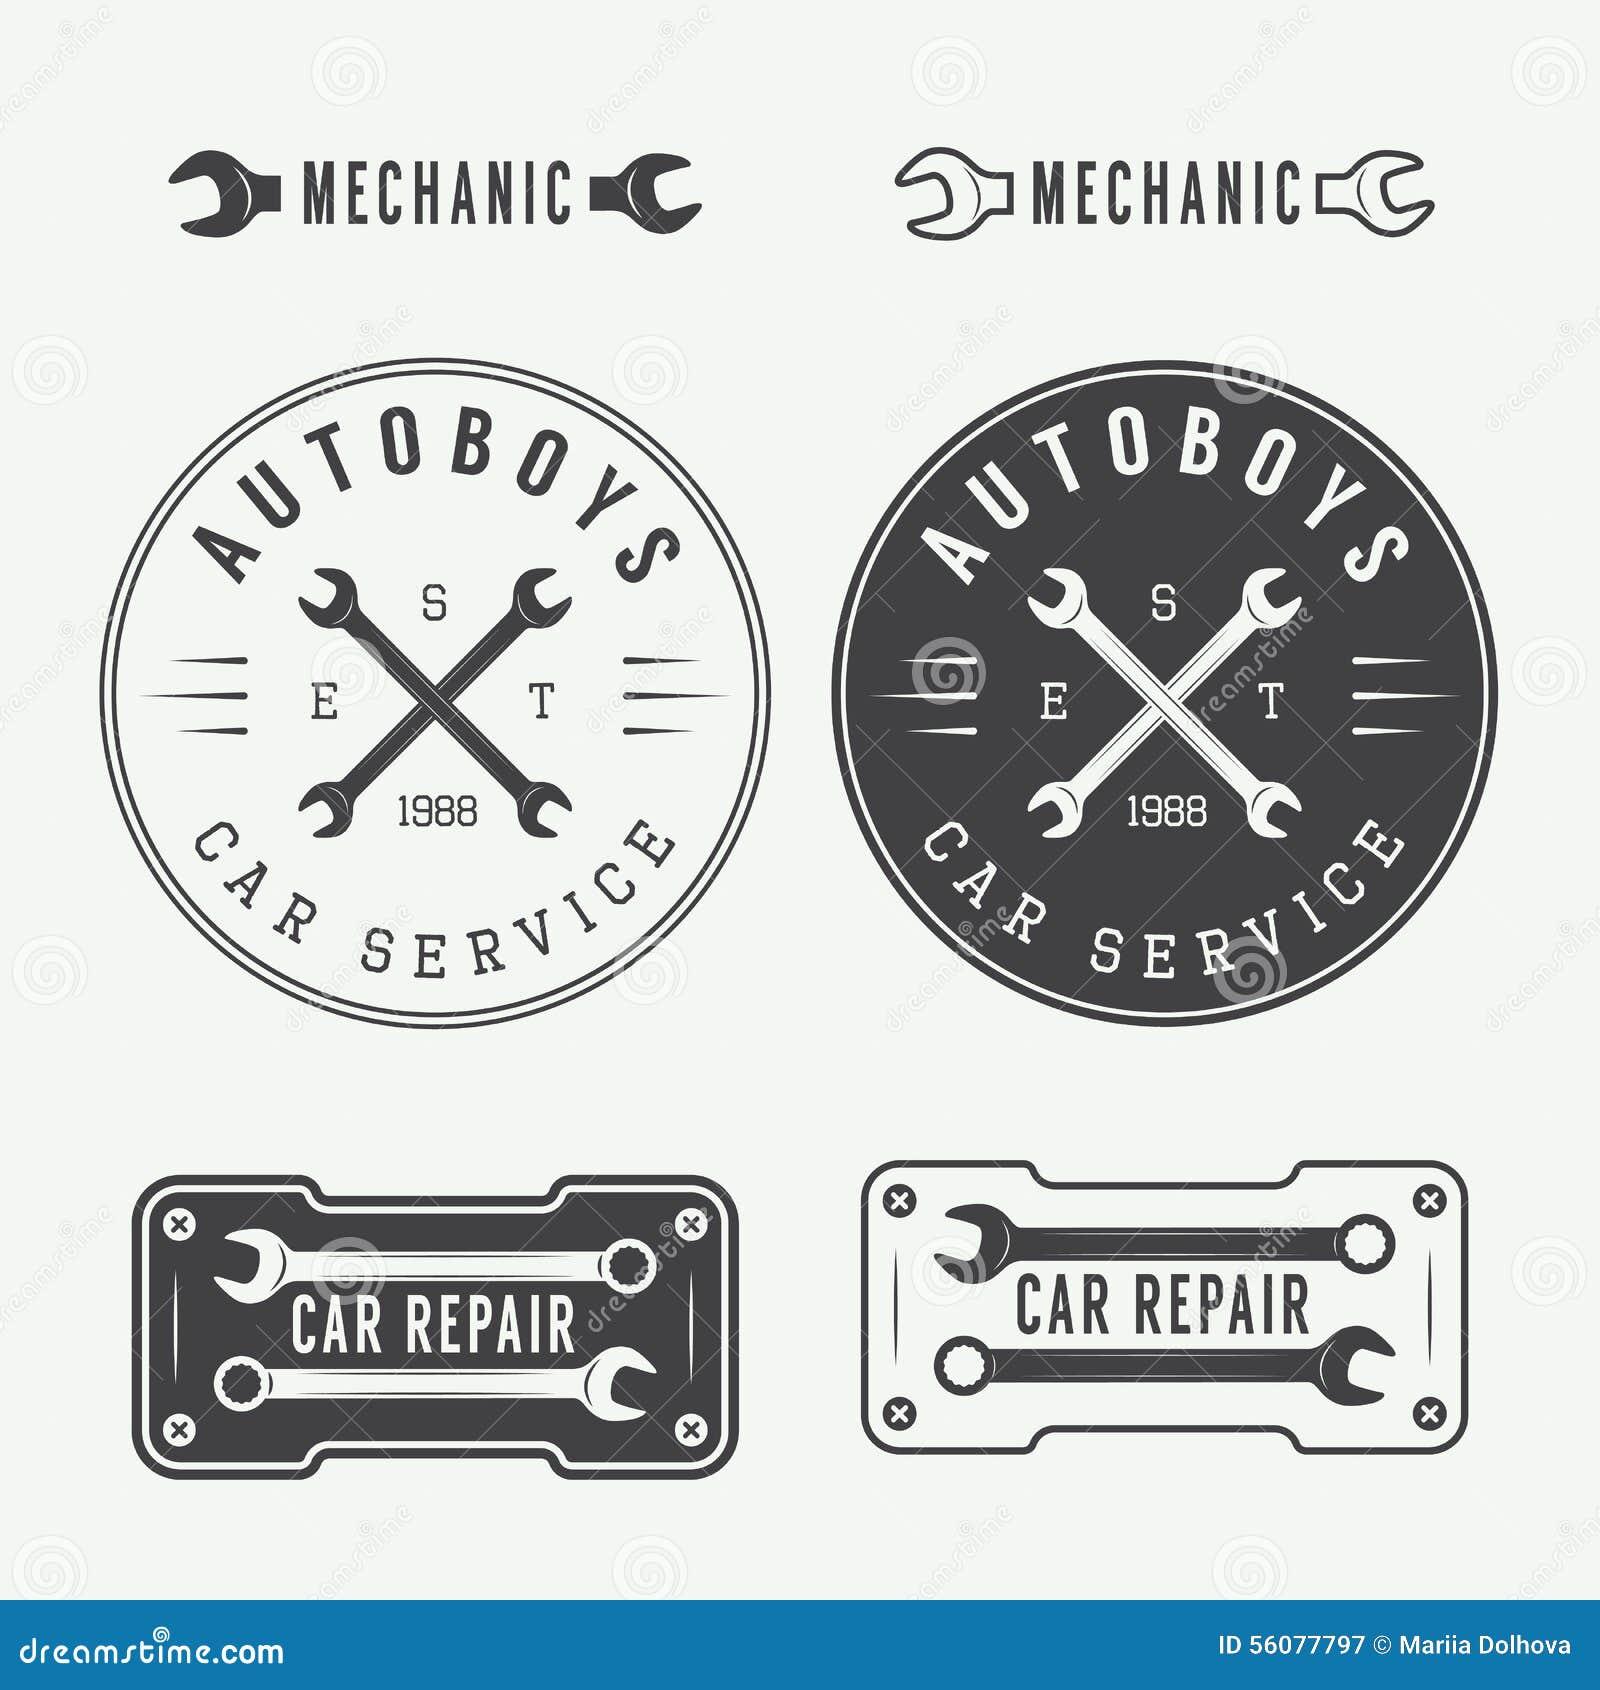 Tire Repair Kit >> Set Of Vintage Mechanic Labels, Emblems And Logo. Vector ...